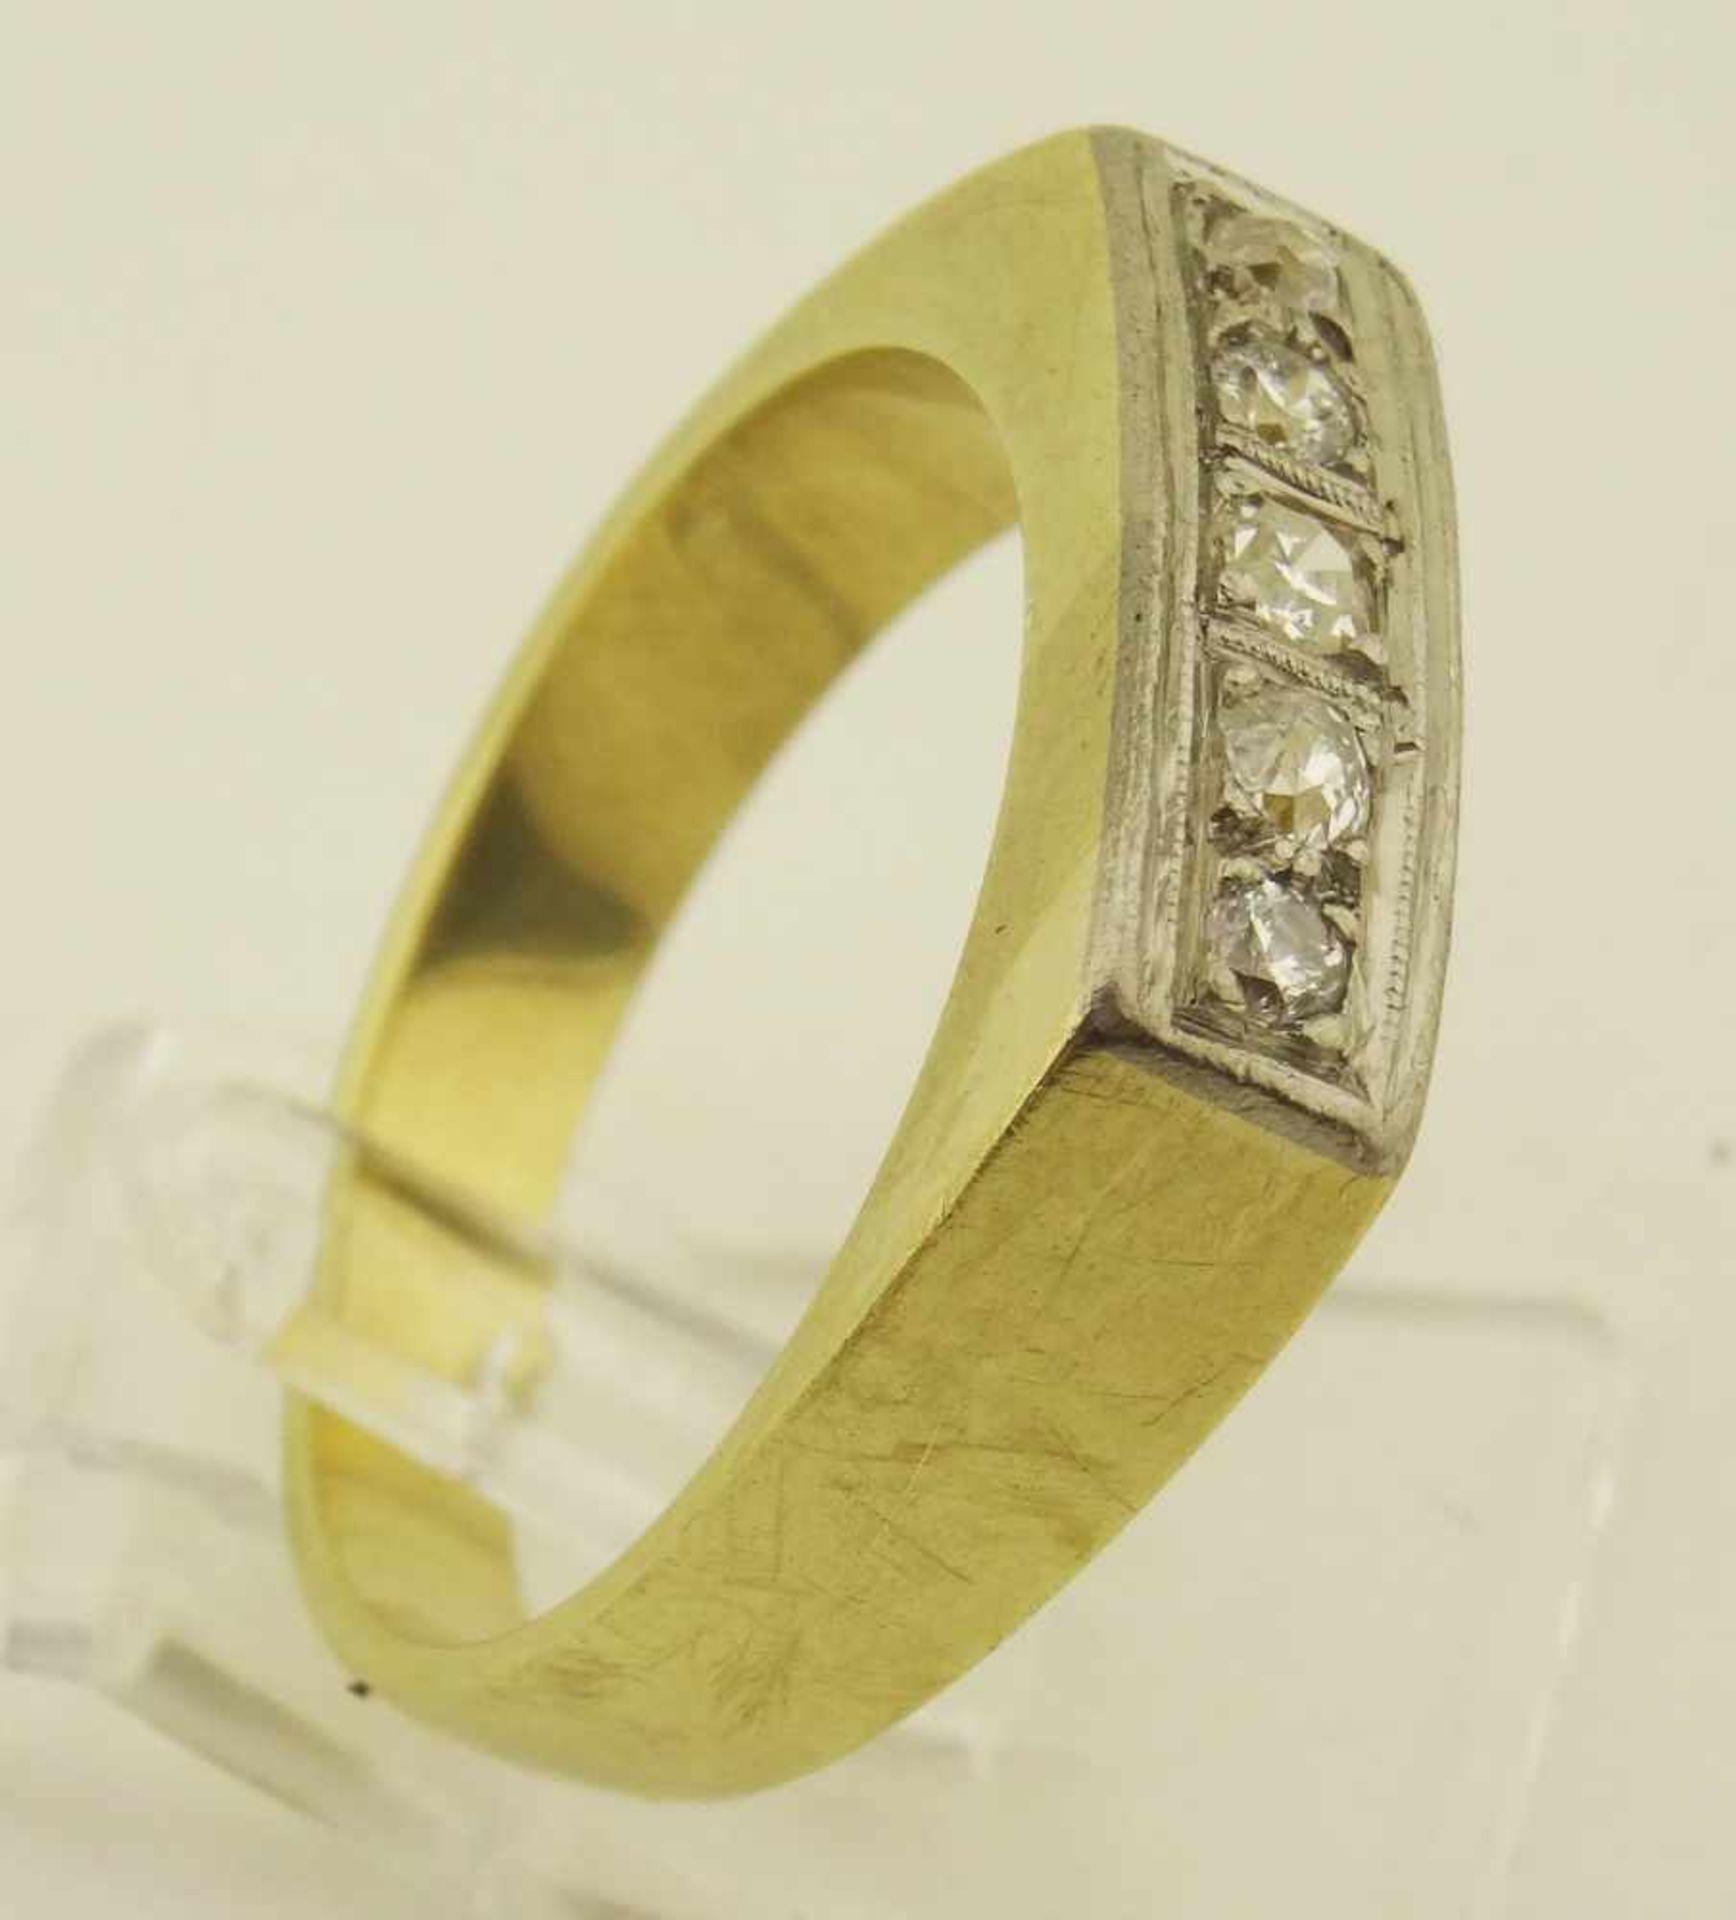 Los 44 - 585 Gold Damenring Brillant 5 Steine Brillant, Diamant auch Altschliff, ges. ca. 0,20ct.,